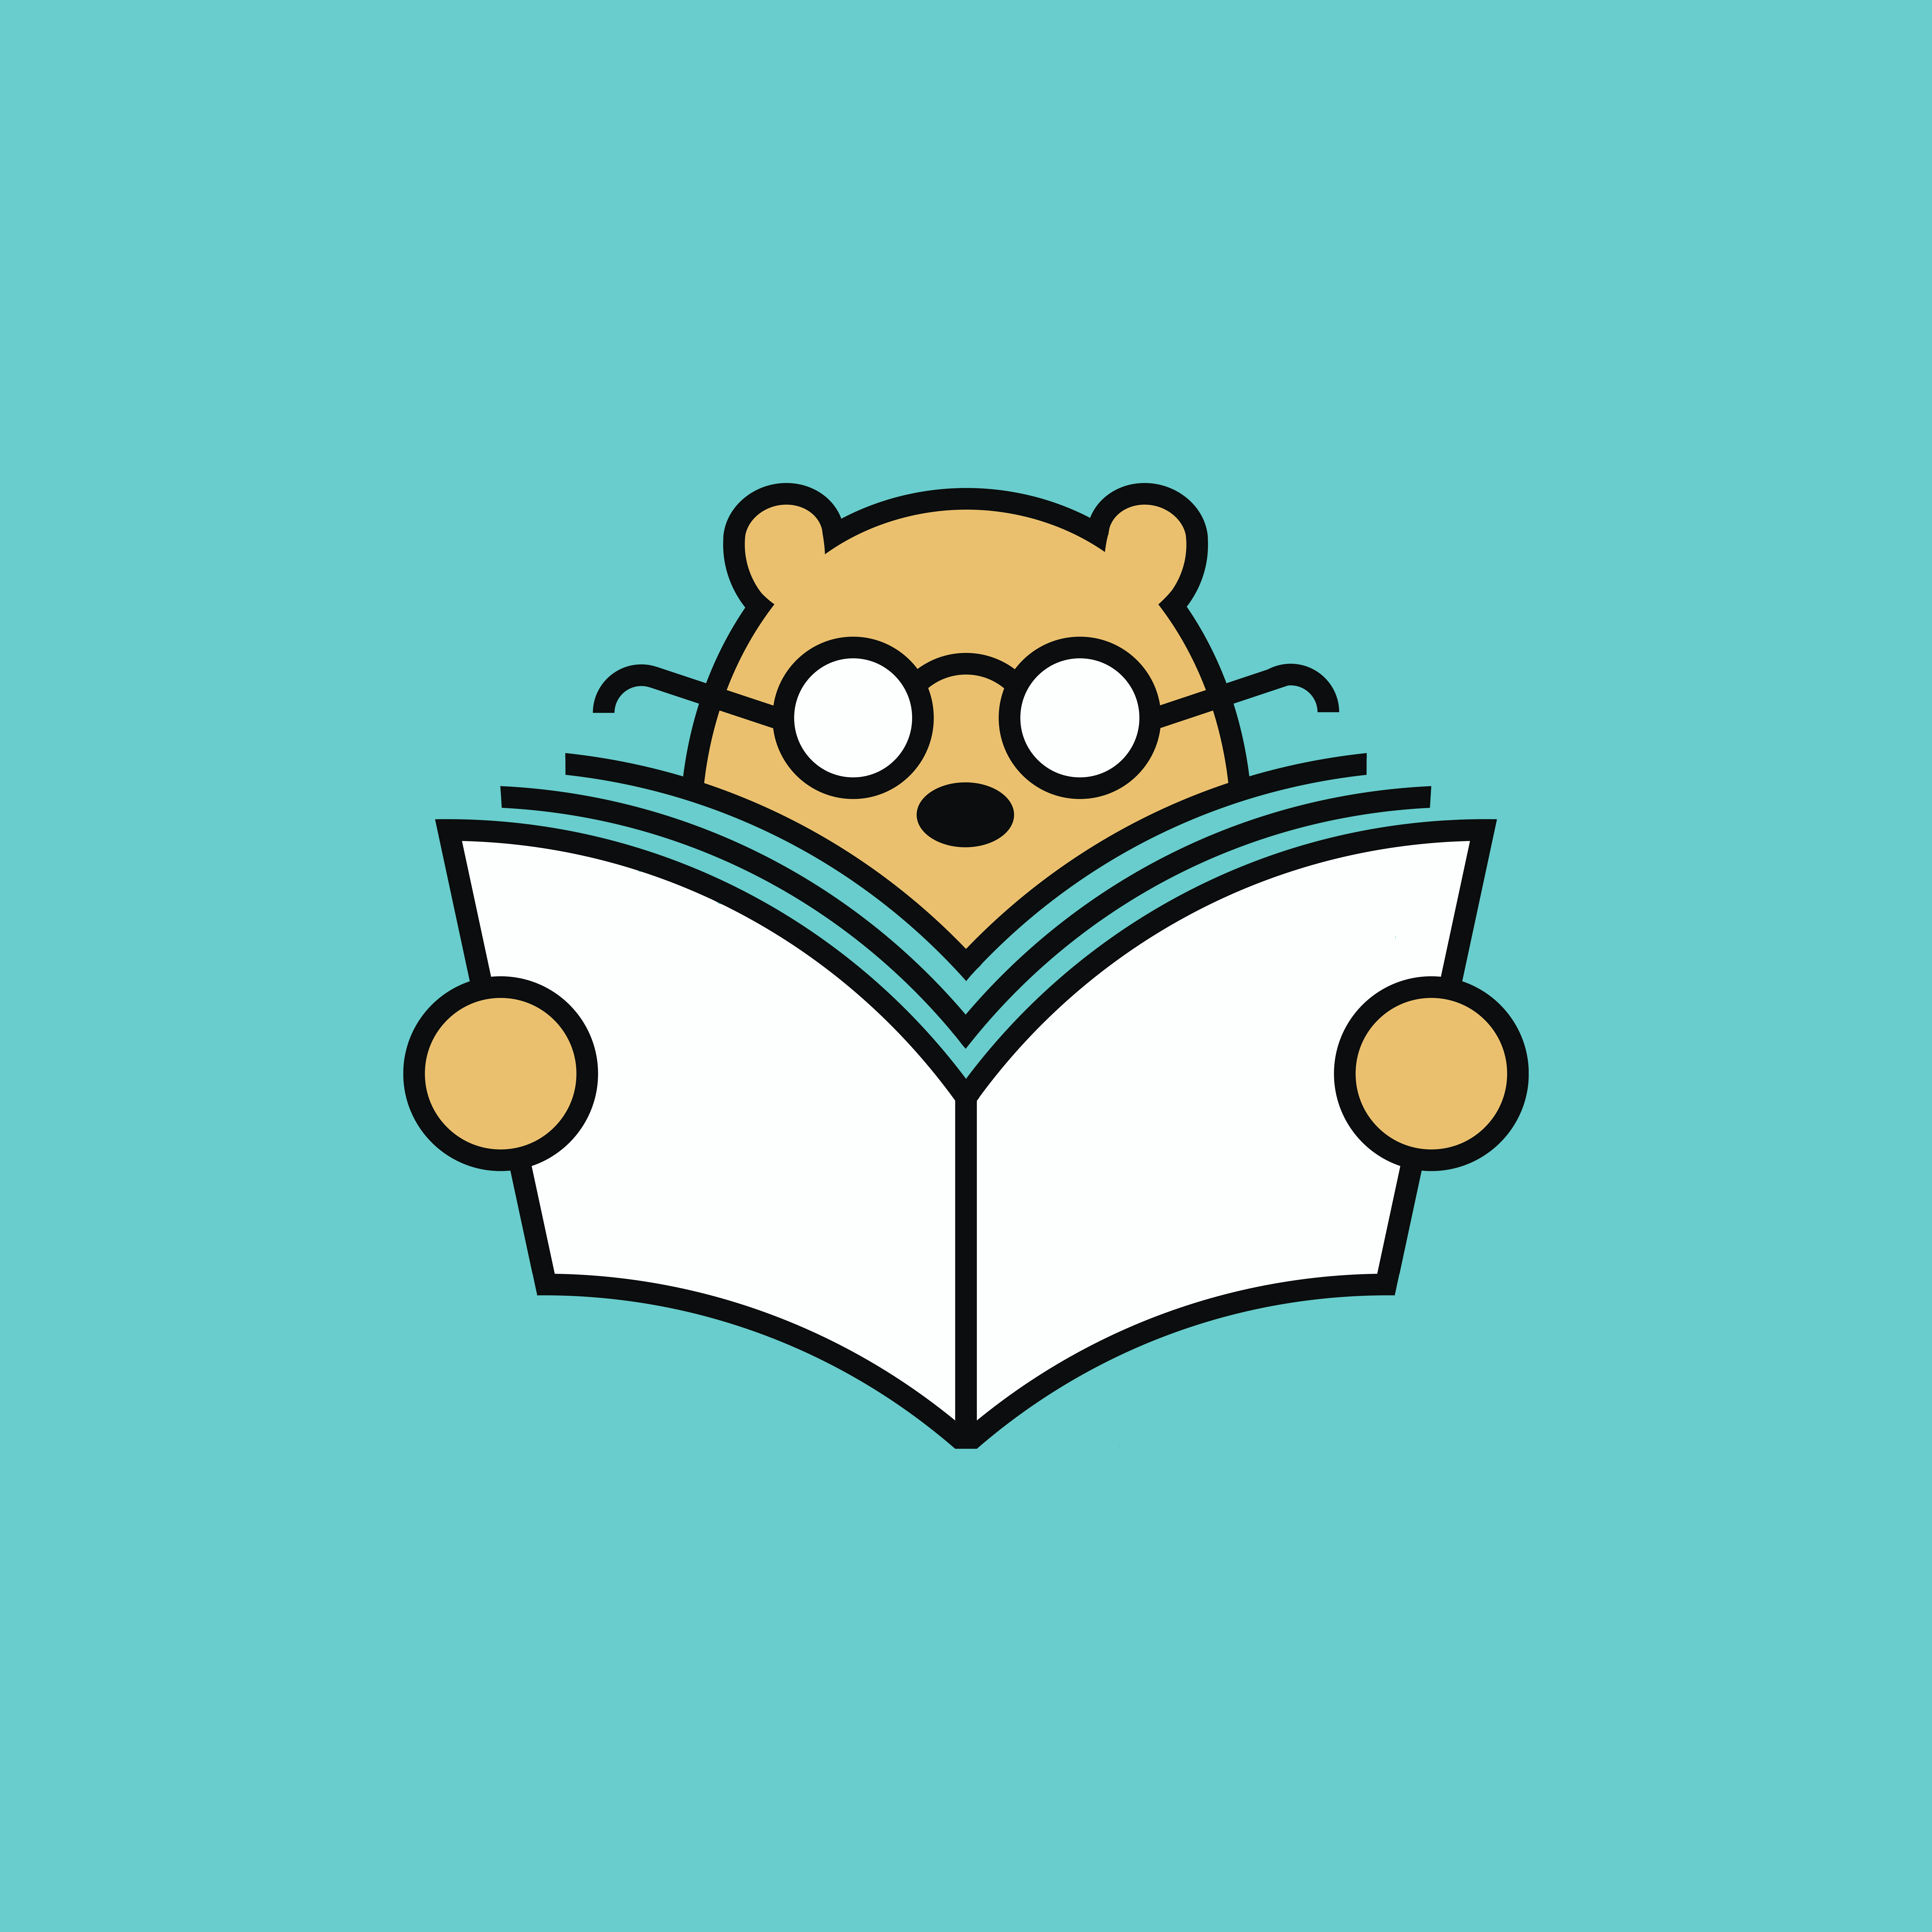 Bad News Bears x Leetify Store